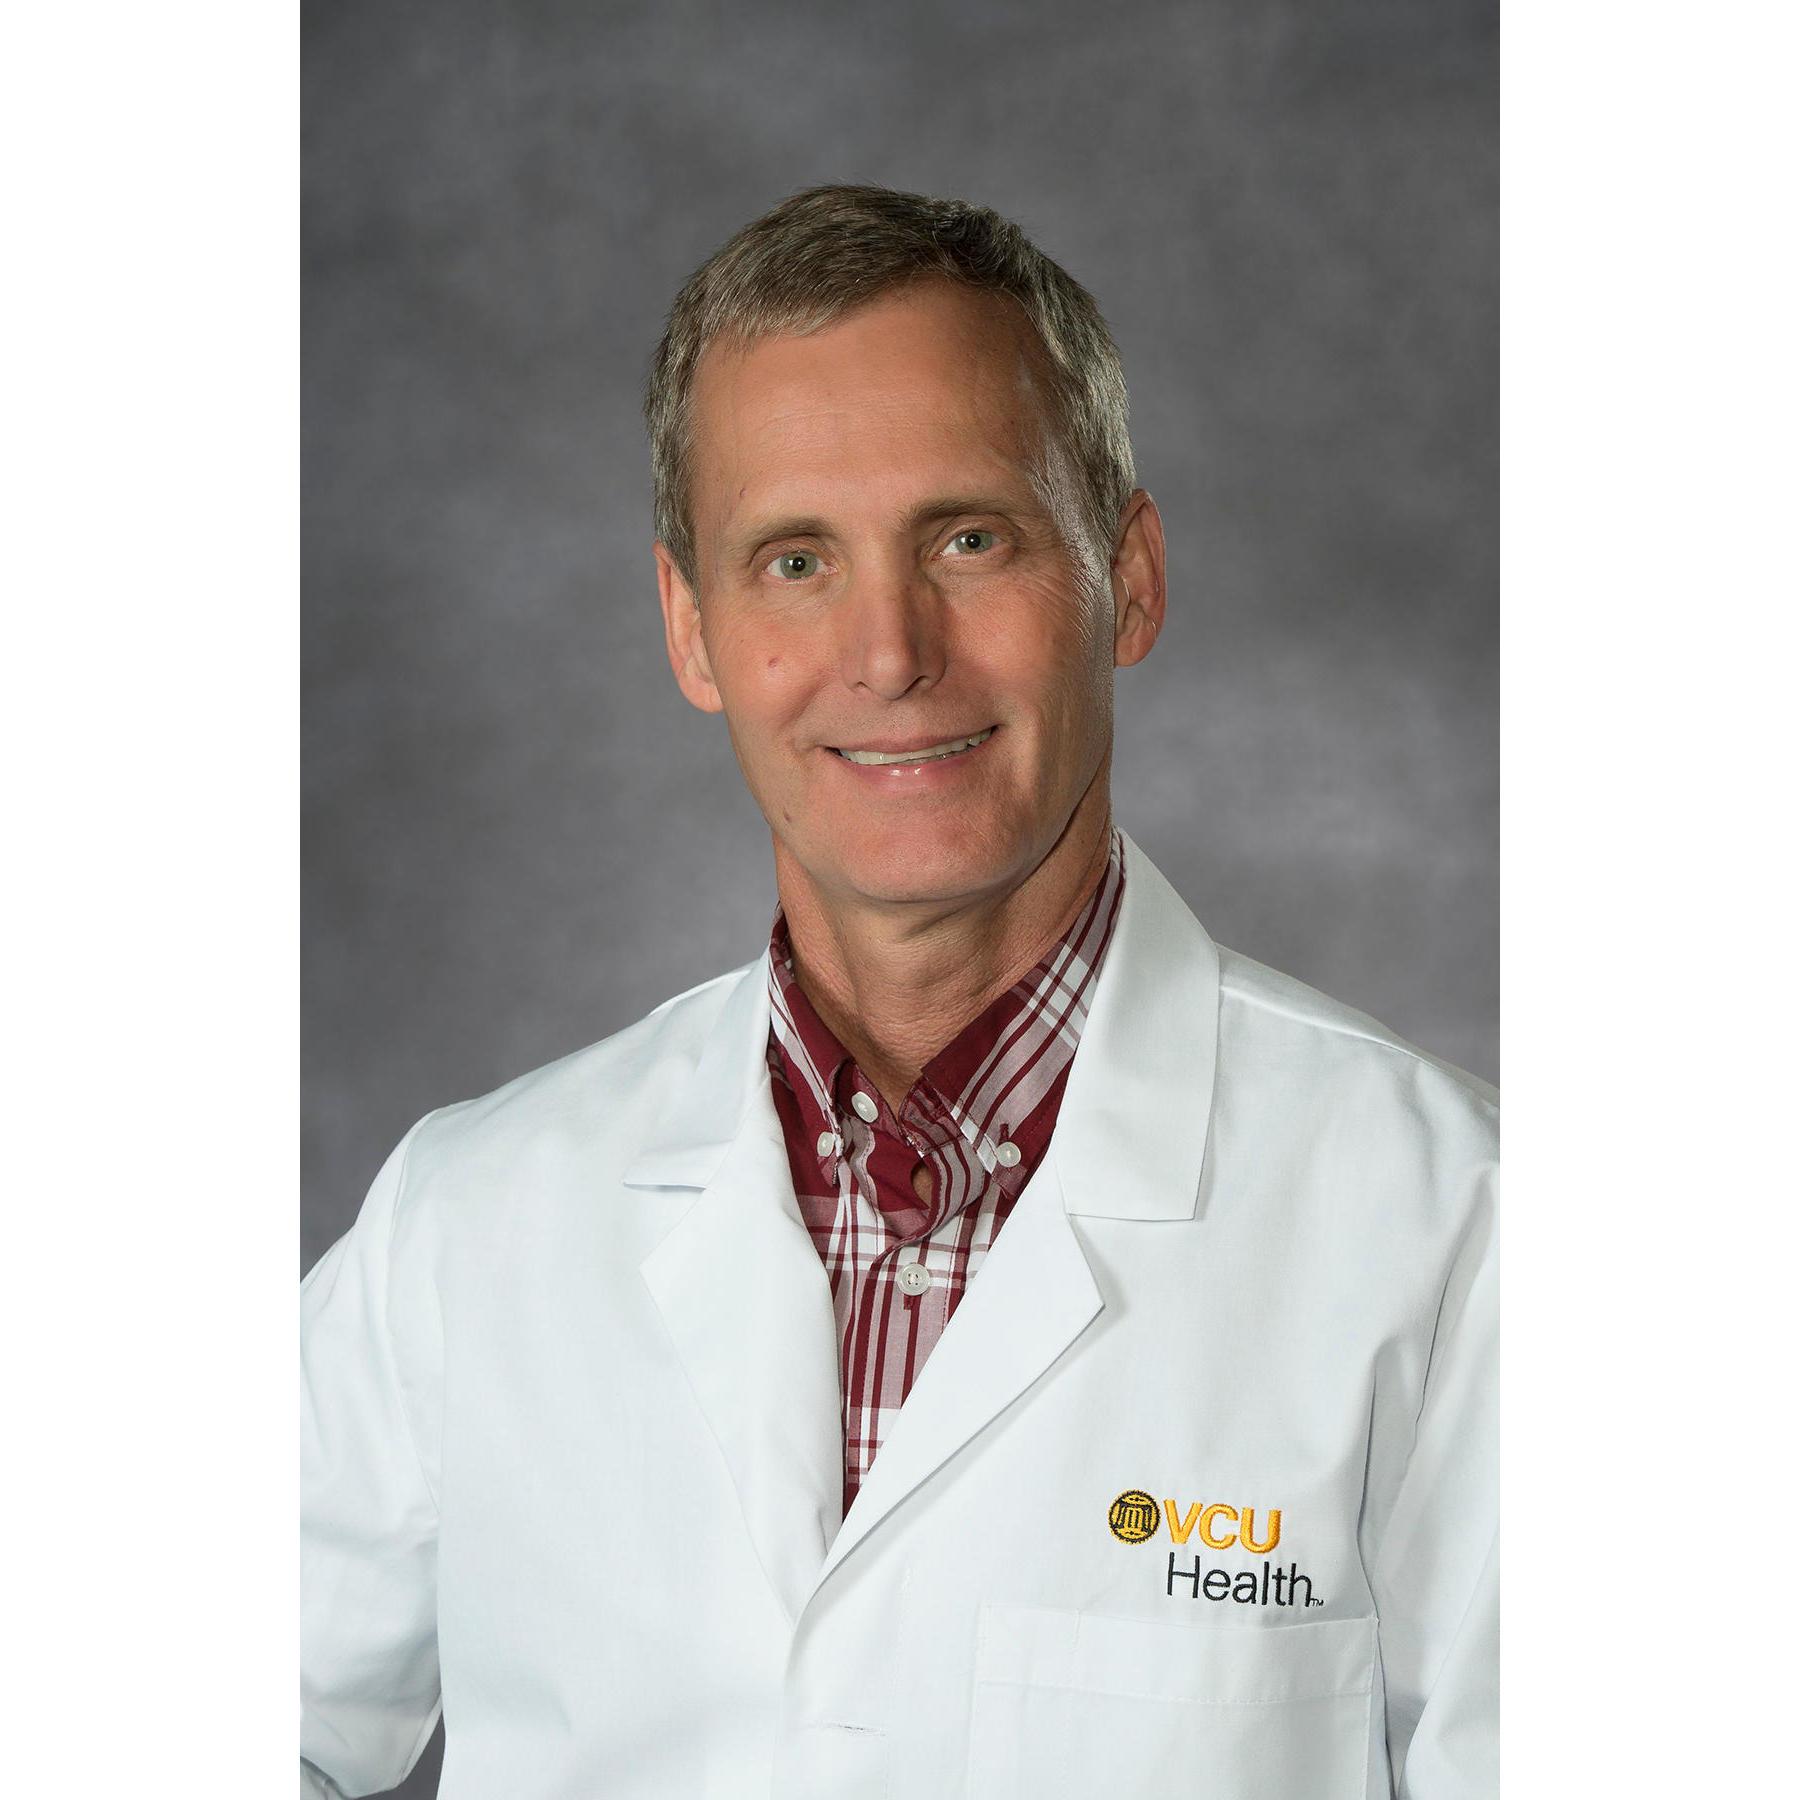 Paul Bailey, MD